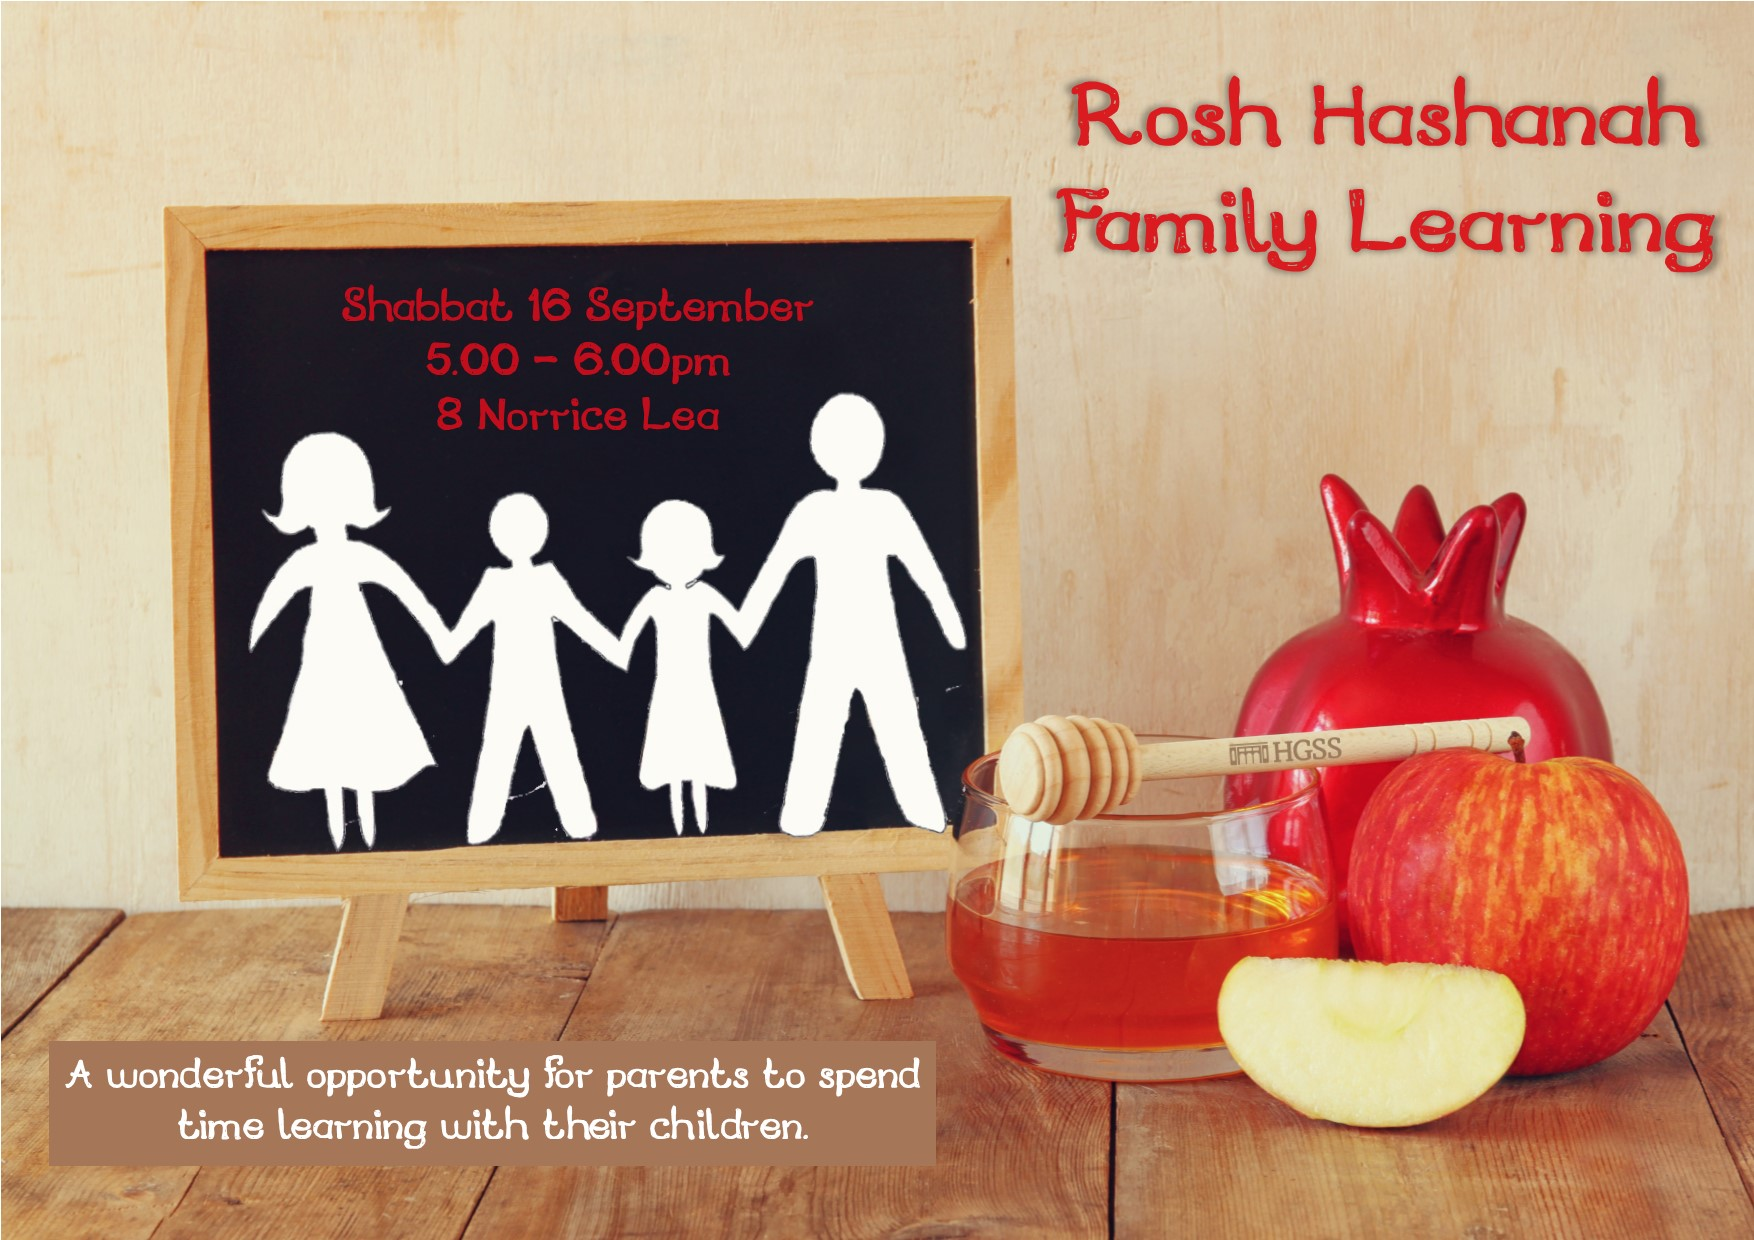 Family Learning @ 8 Norrice Lea